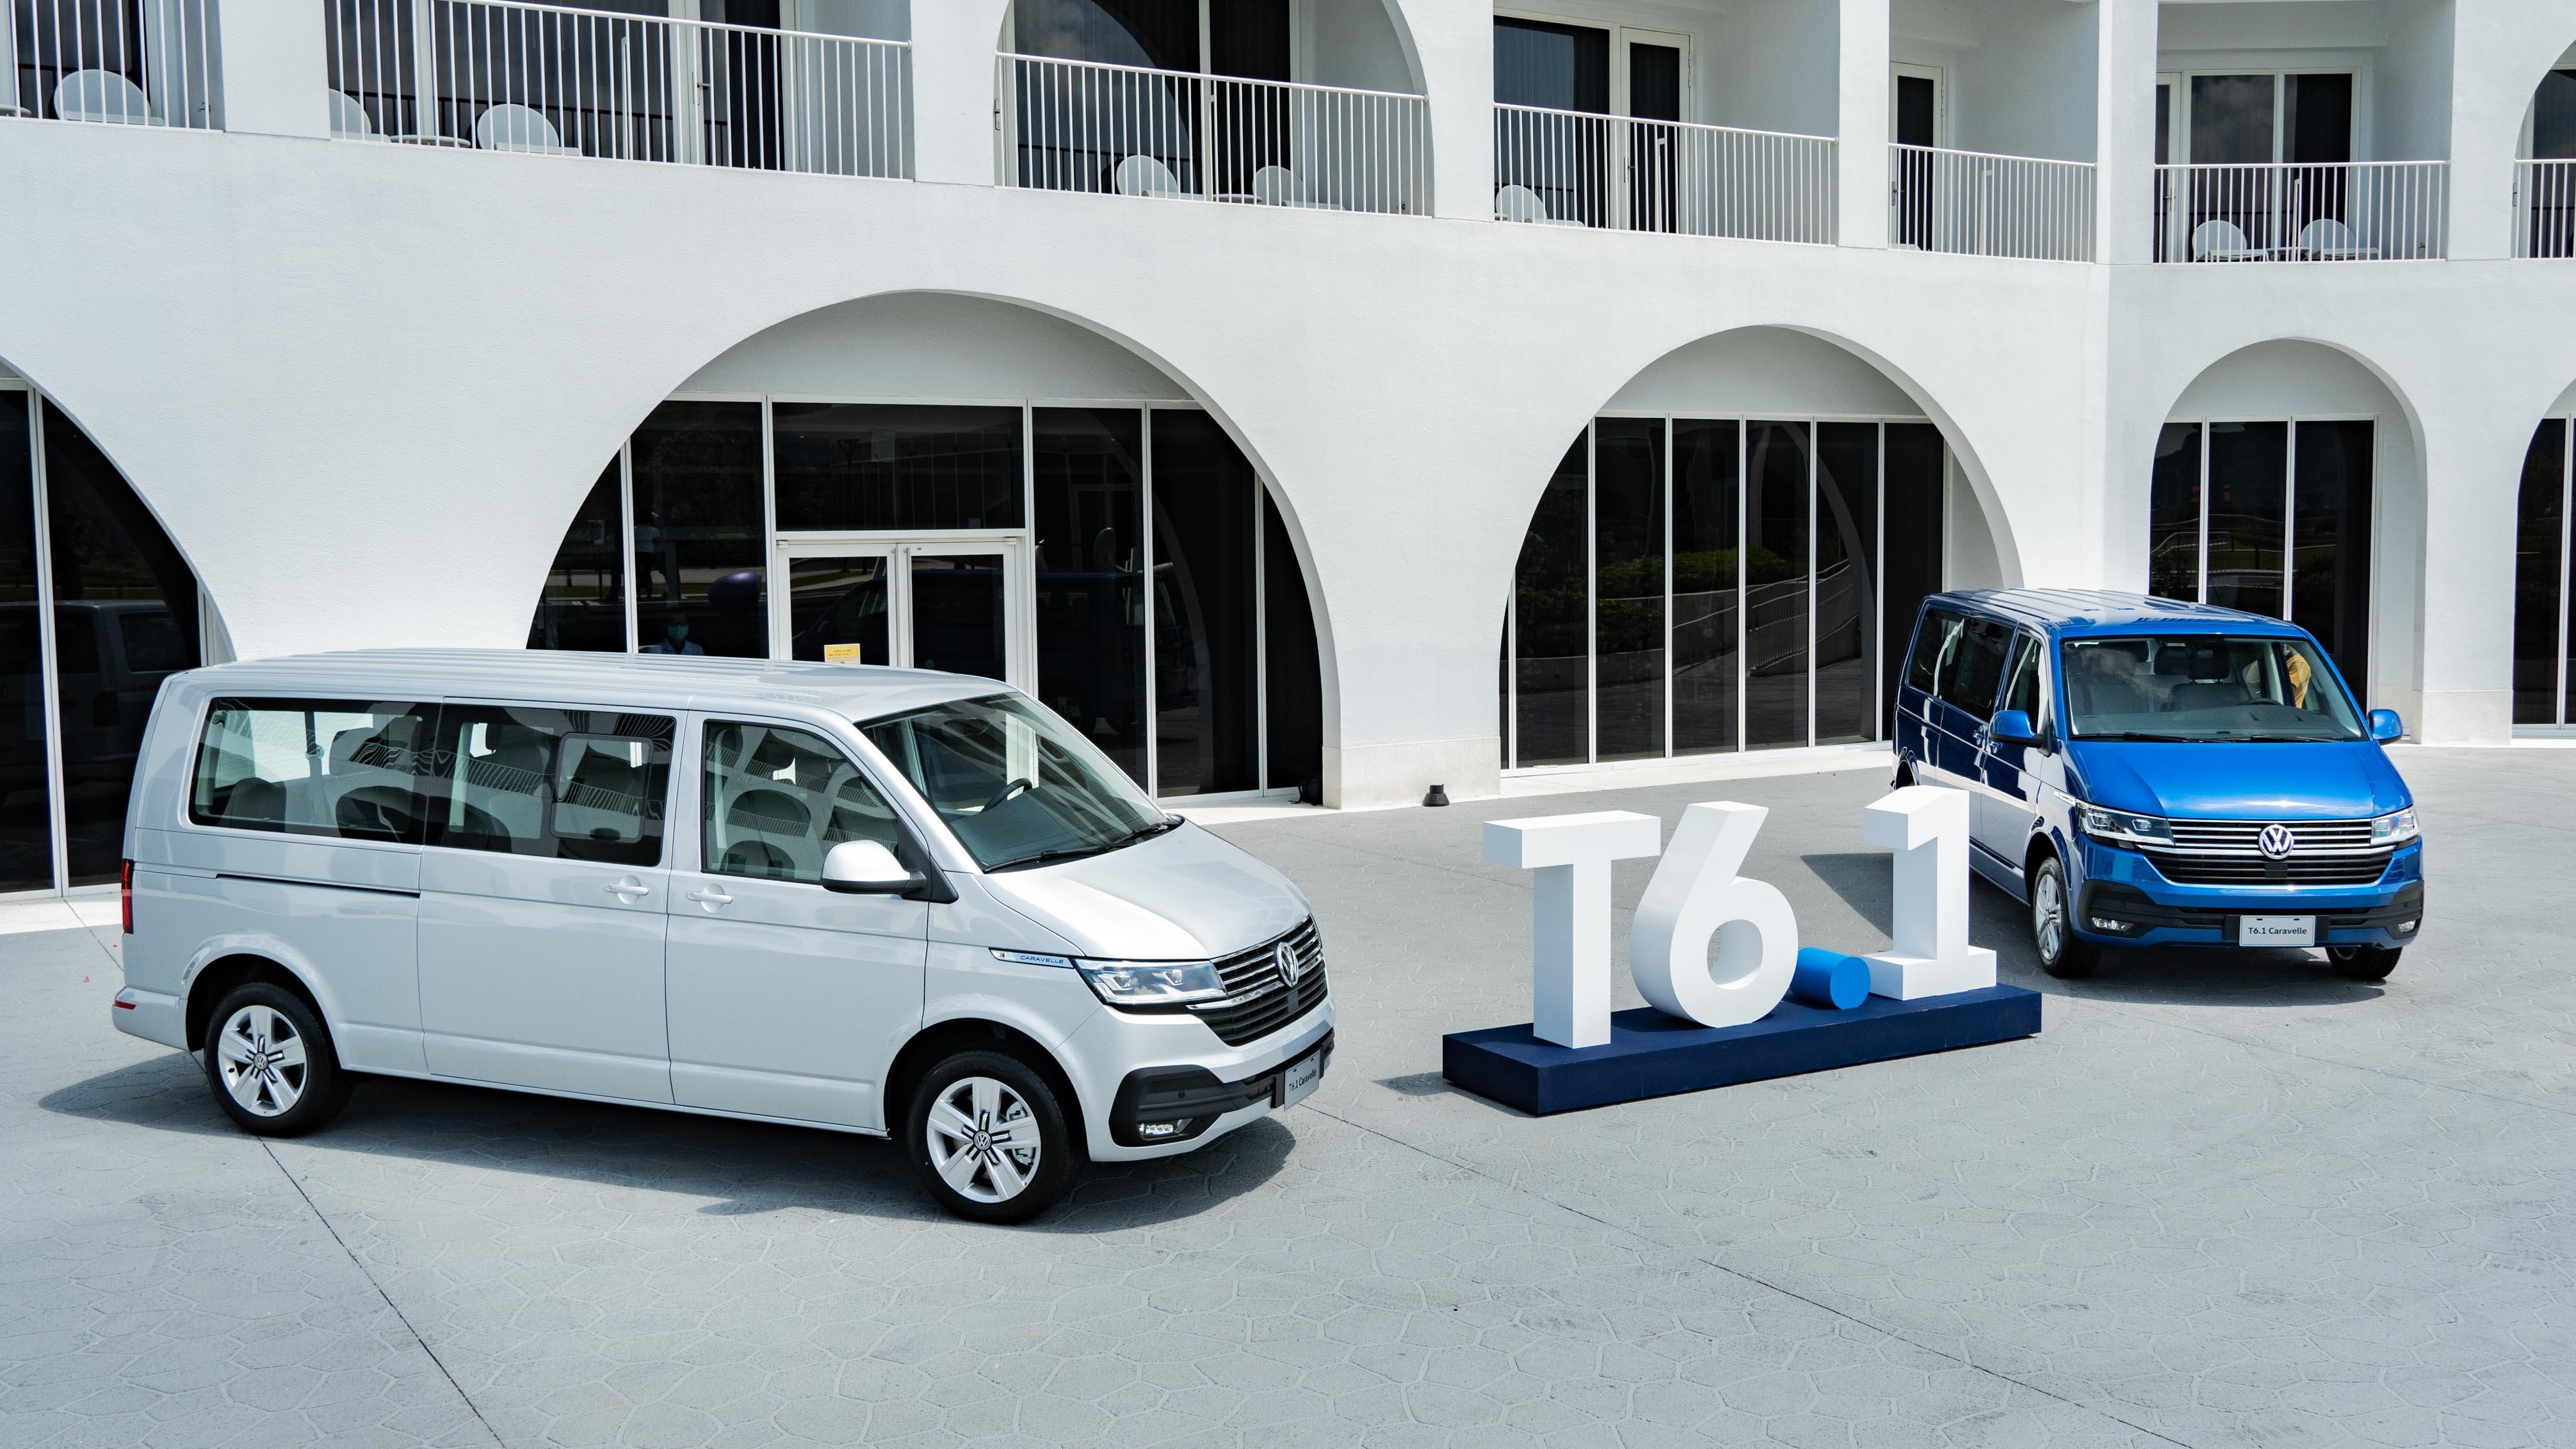 VWCV T6.1 Caravelle 多了 0.1, 是否讓運將更 Happy?